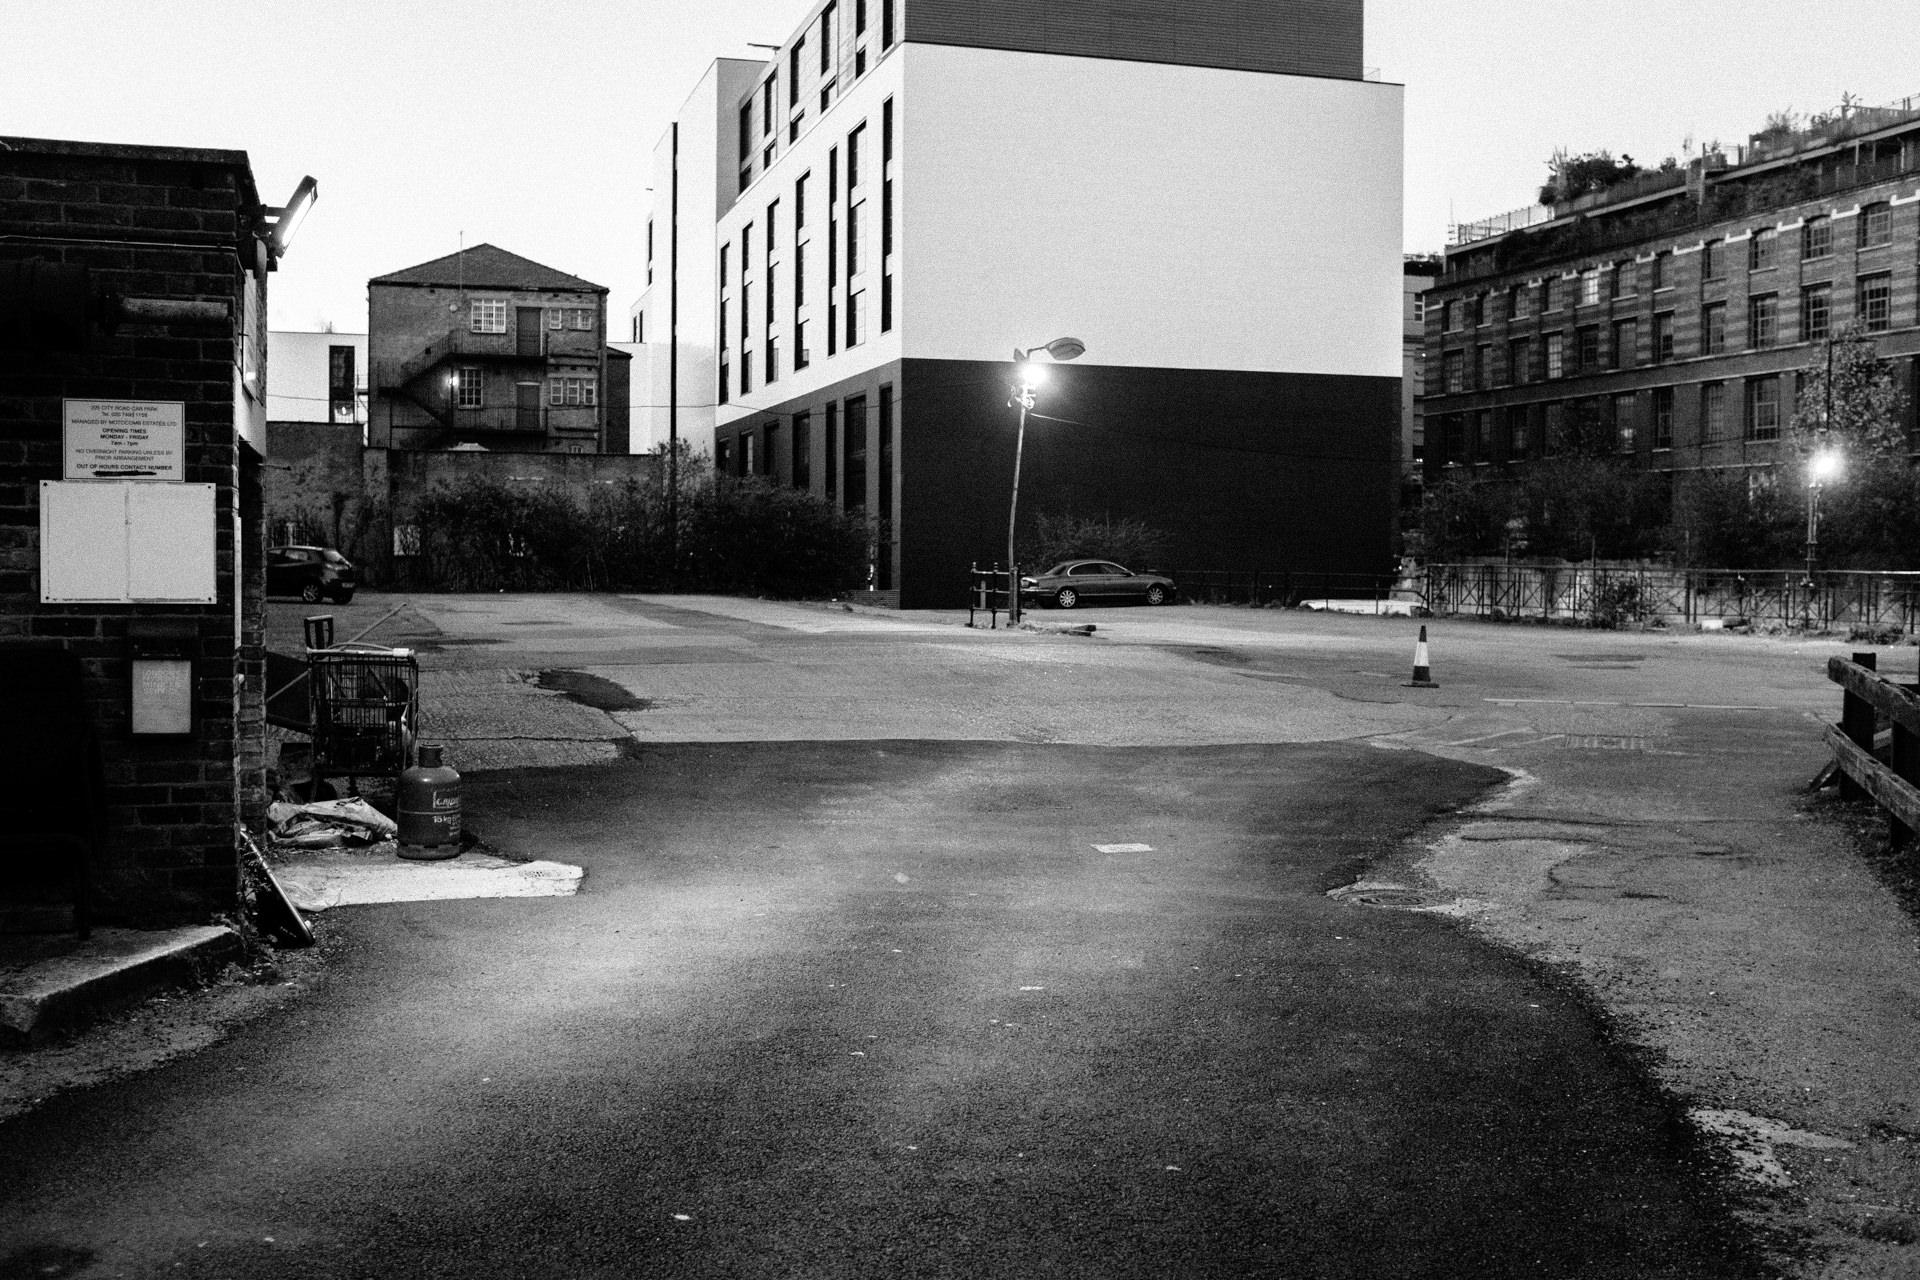 Empty oldstreet parking